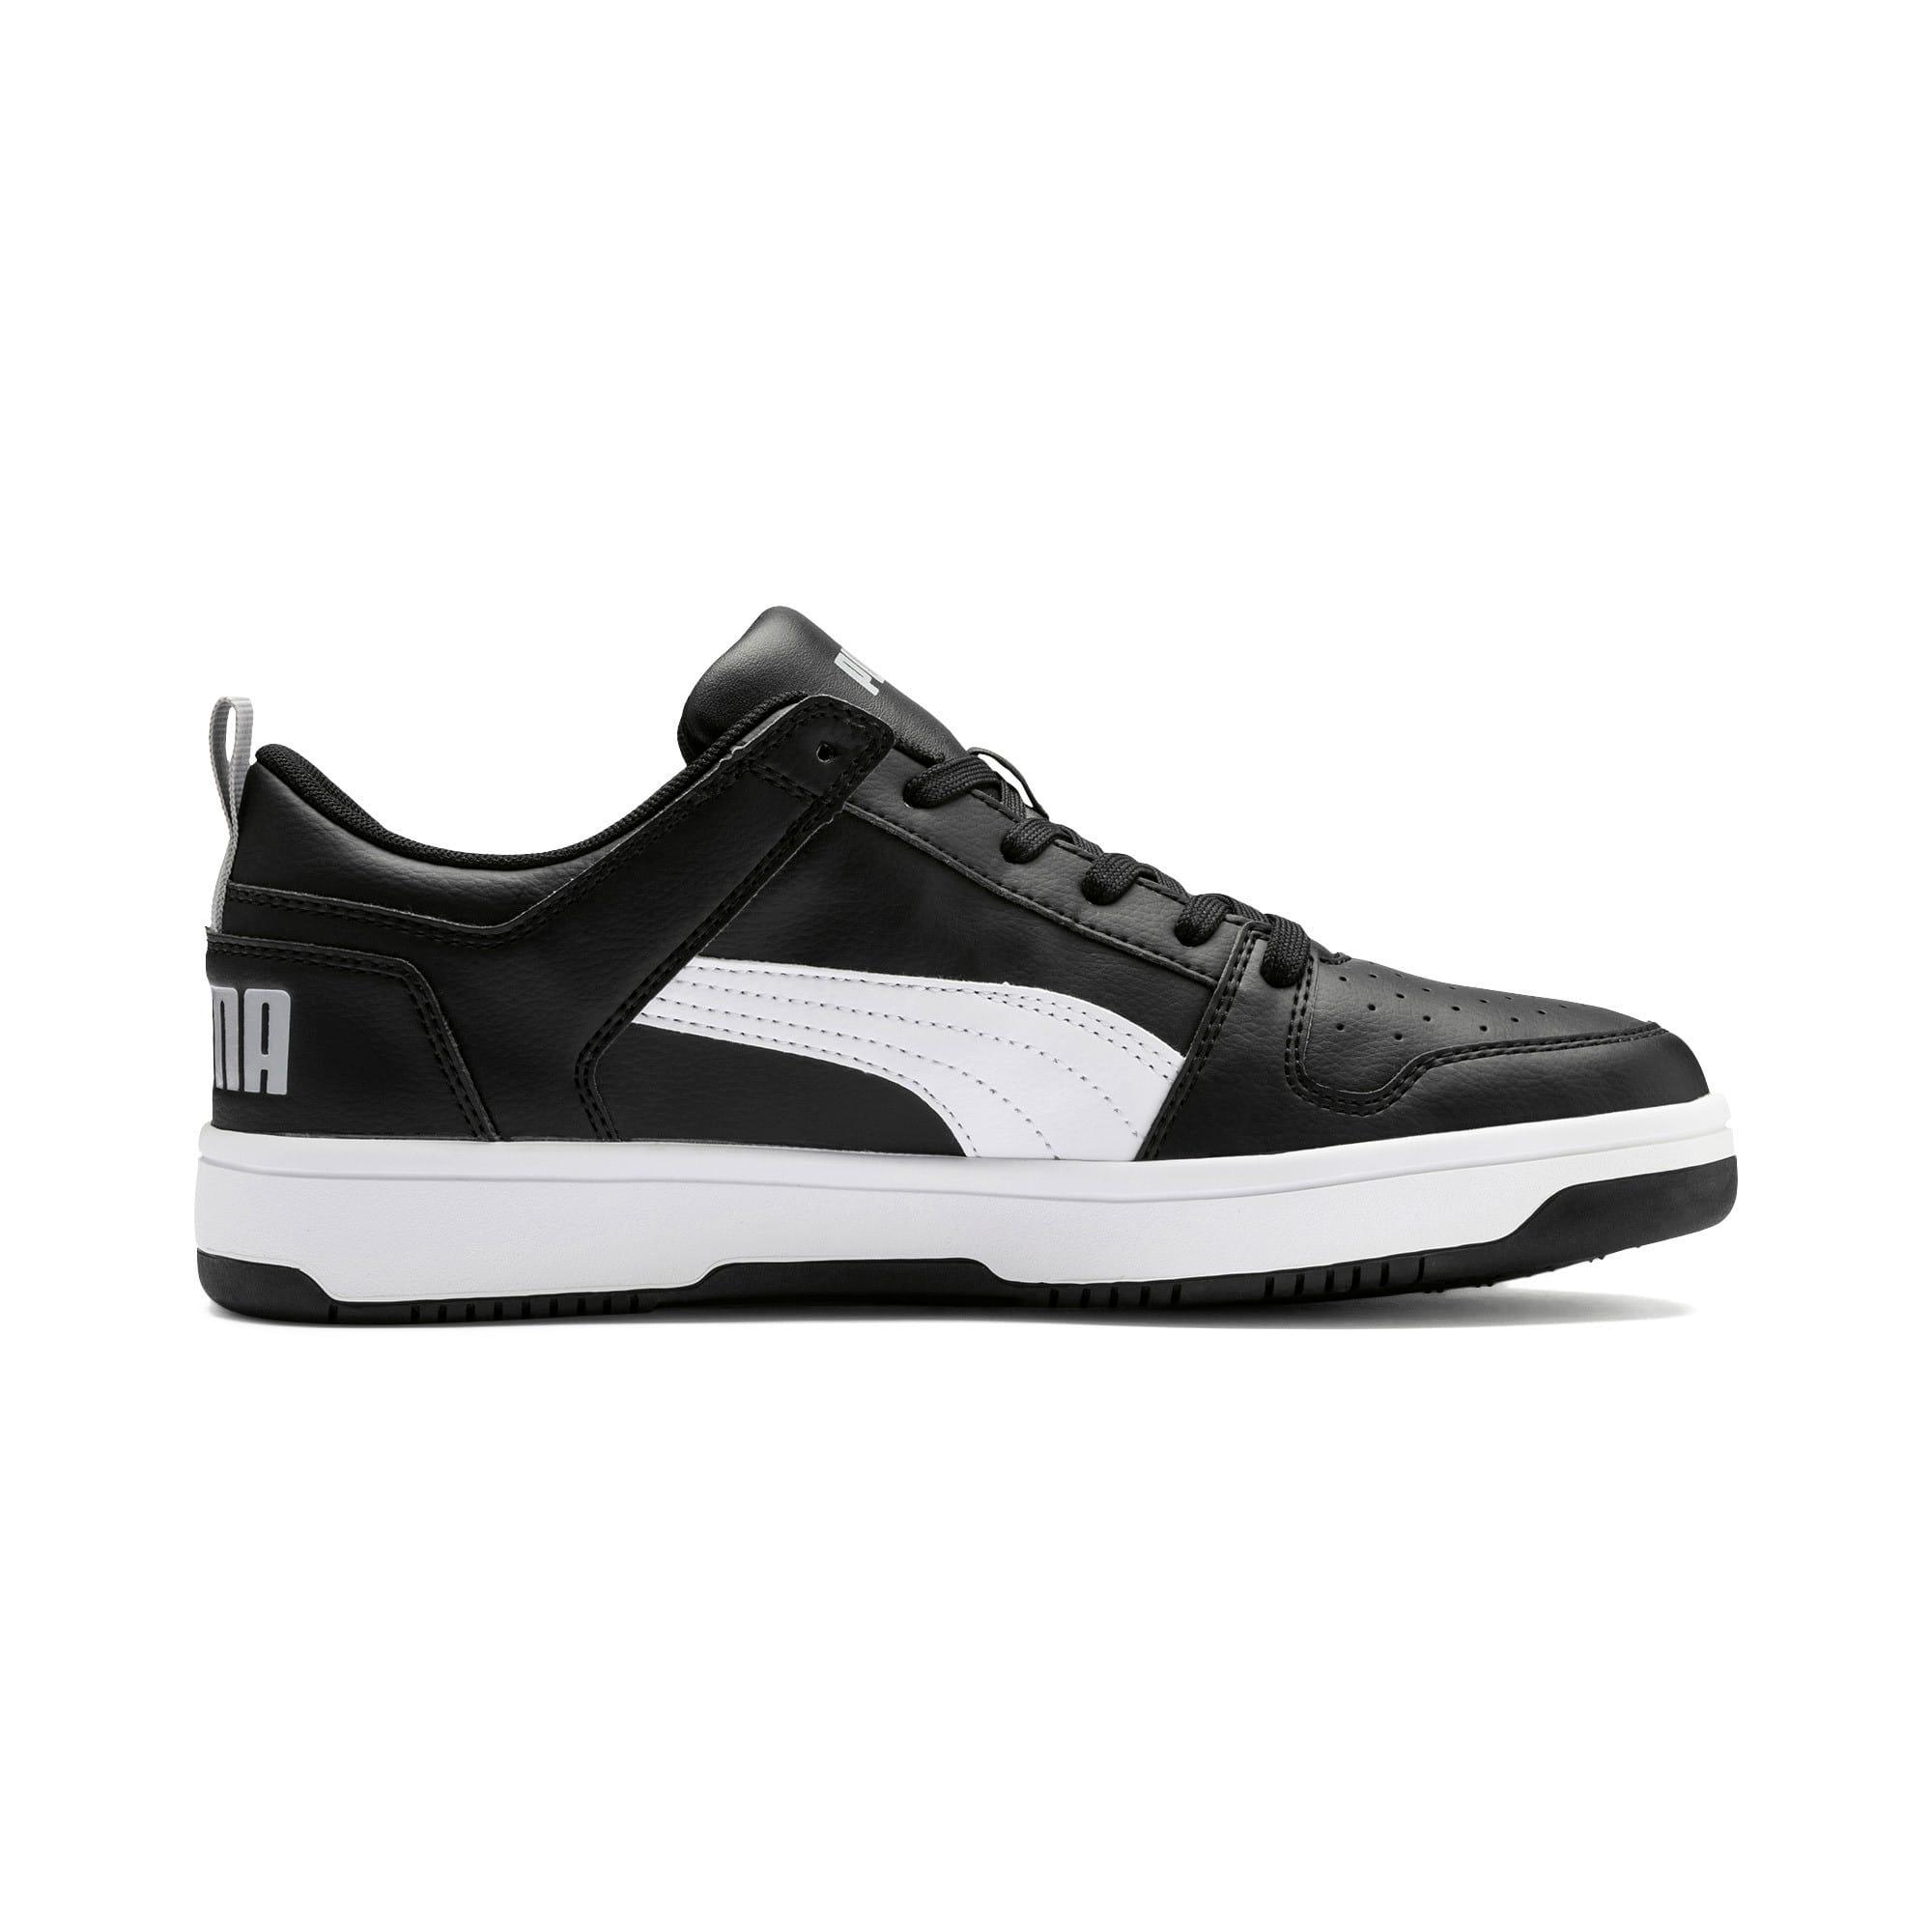 Thumbnail 6 of PUMA Rebound LayUp Lo Sneakers, Puma Black-White-High Rise, medium